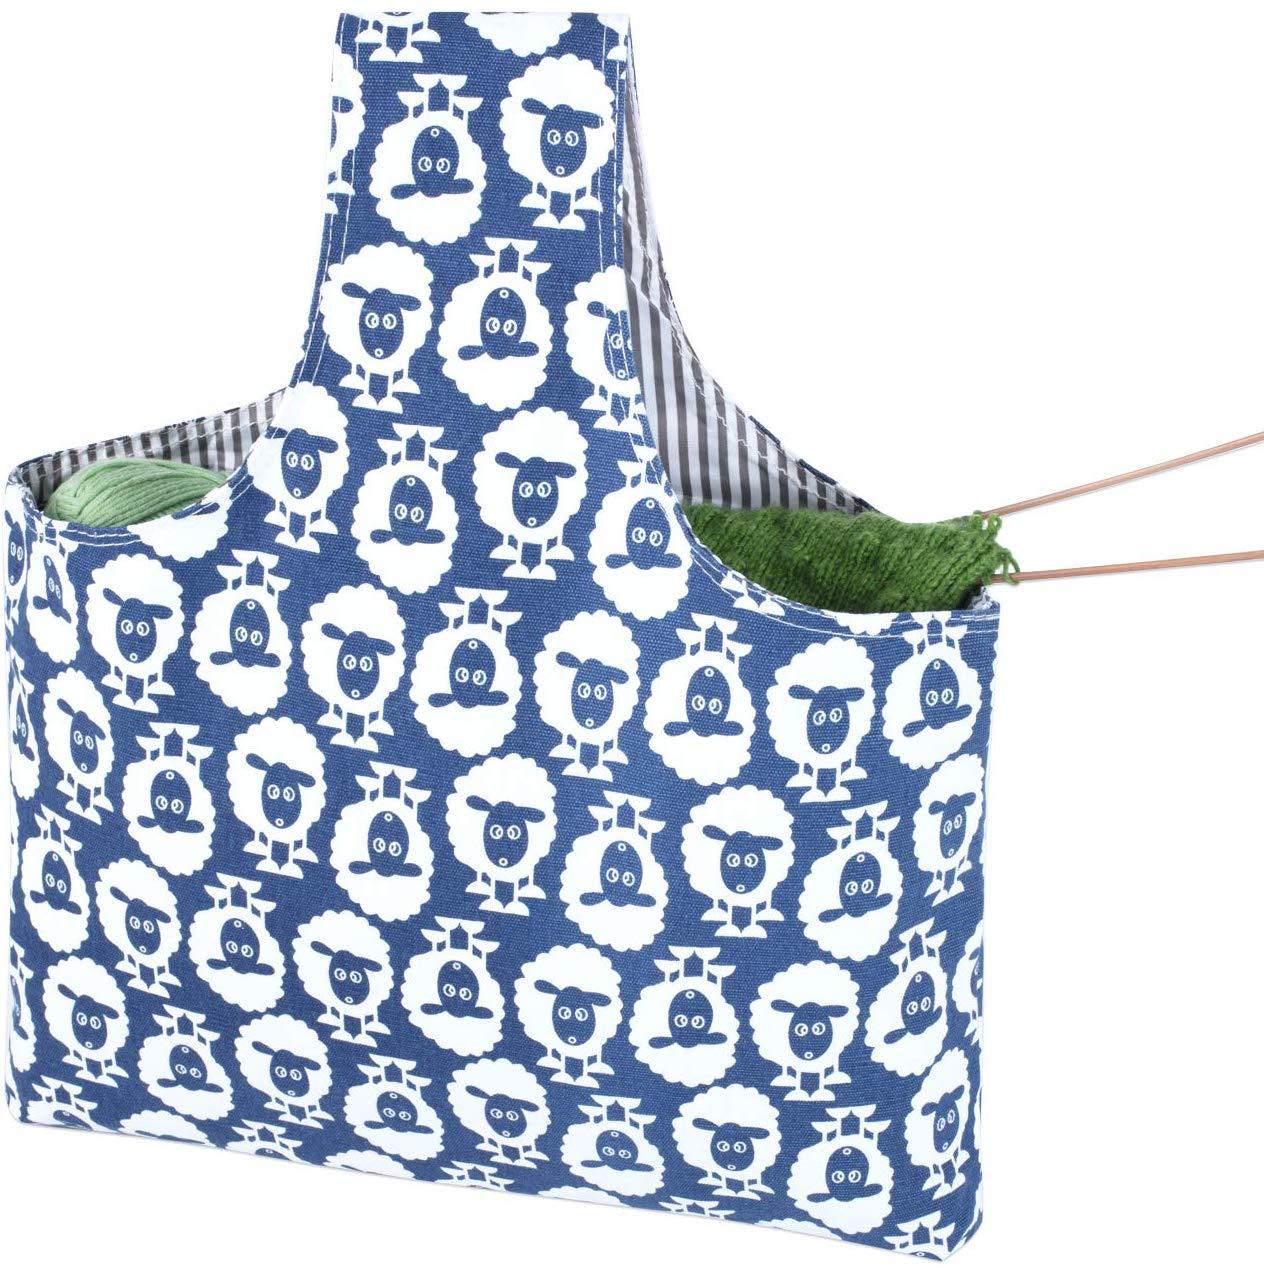 Teamoy Knitting Tote Bag